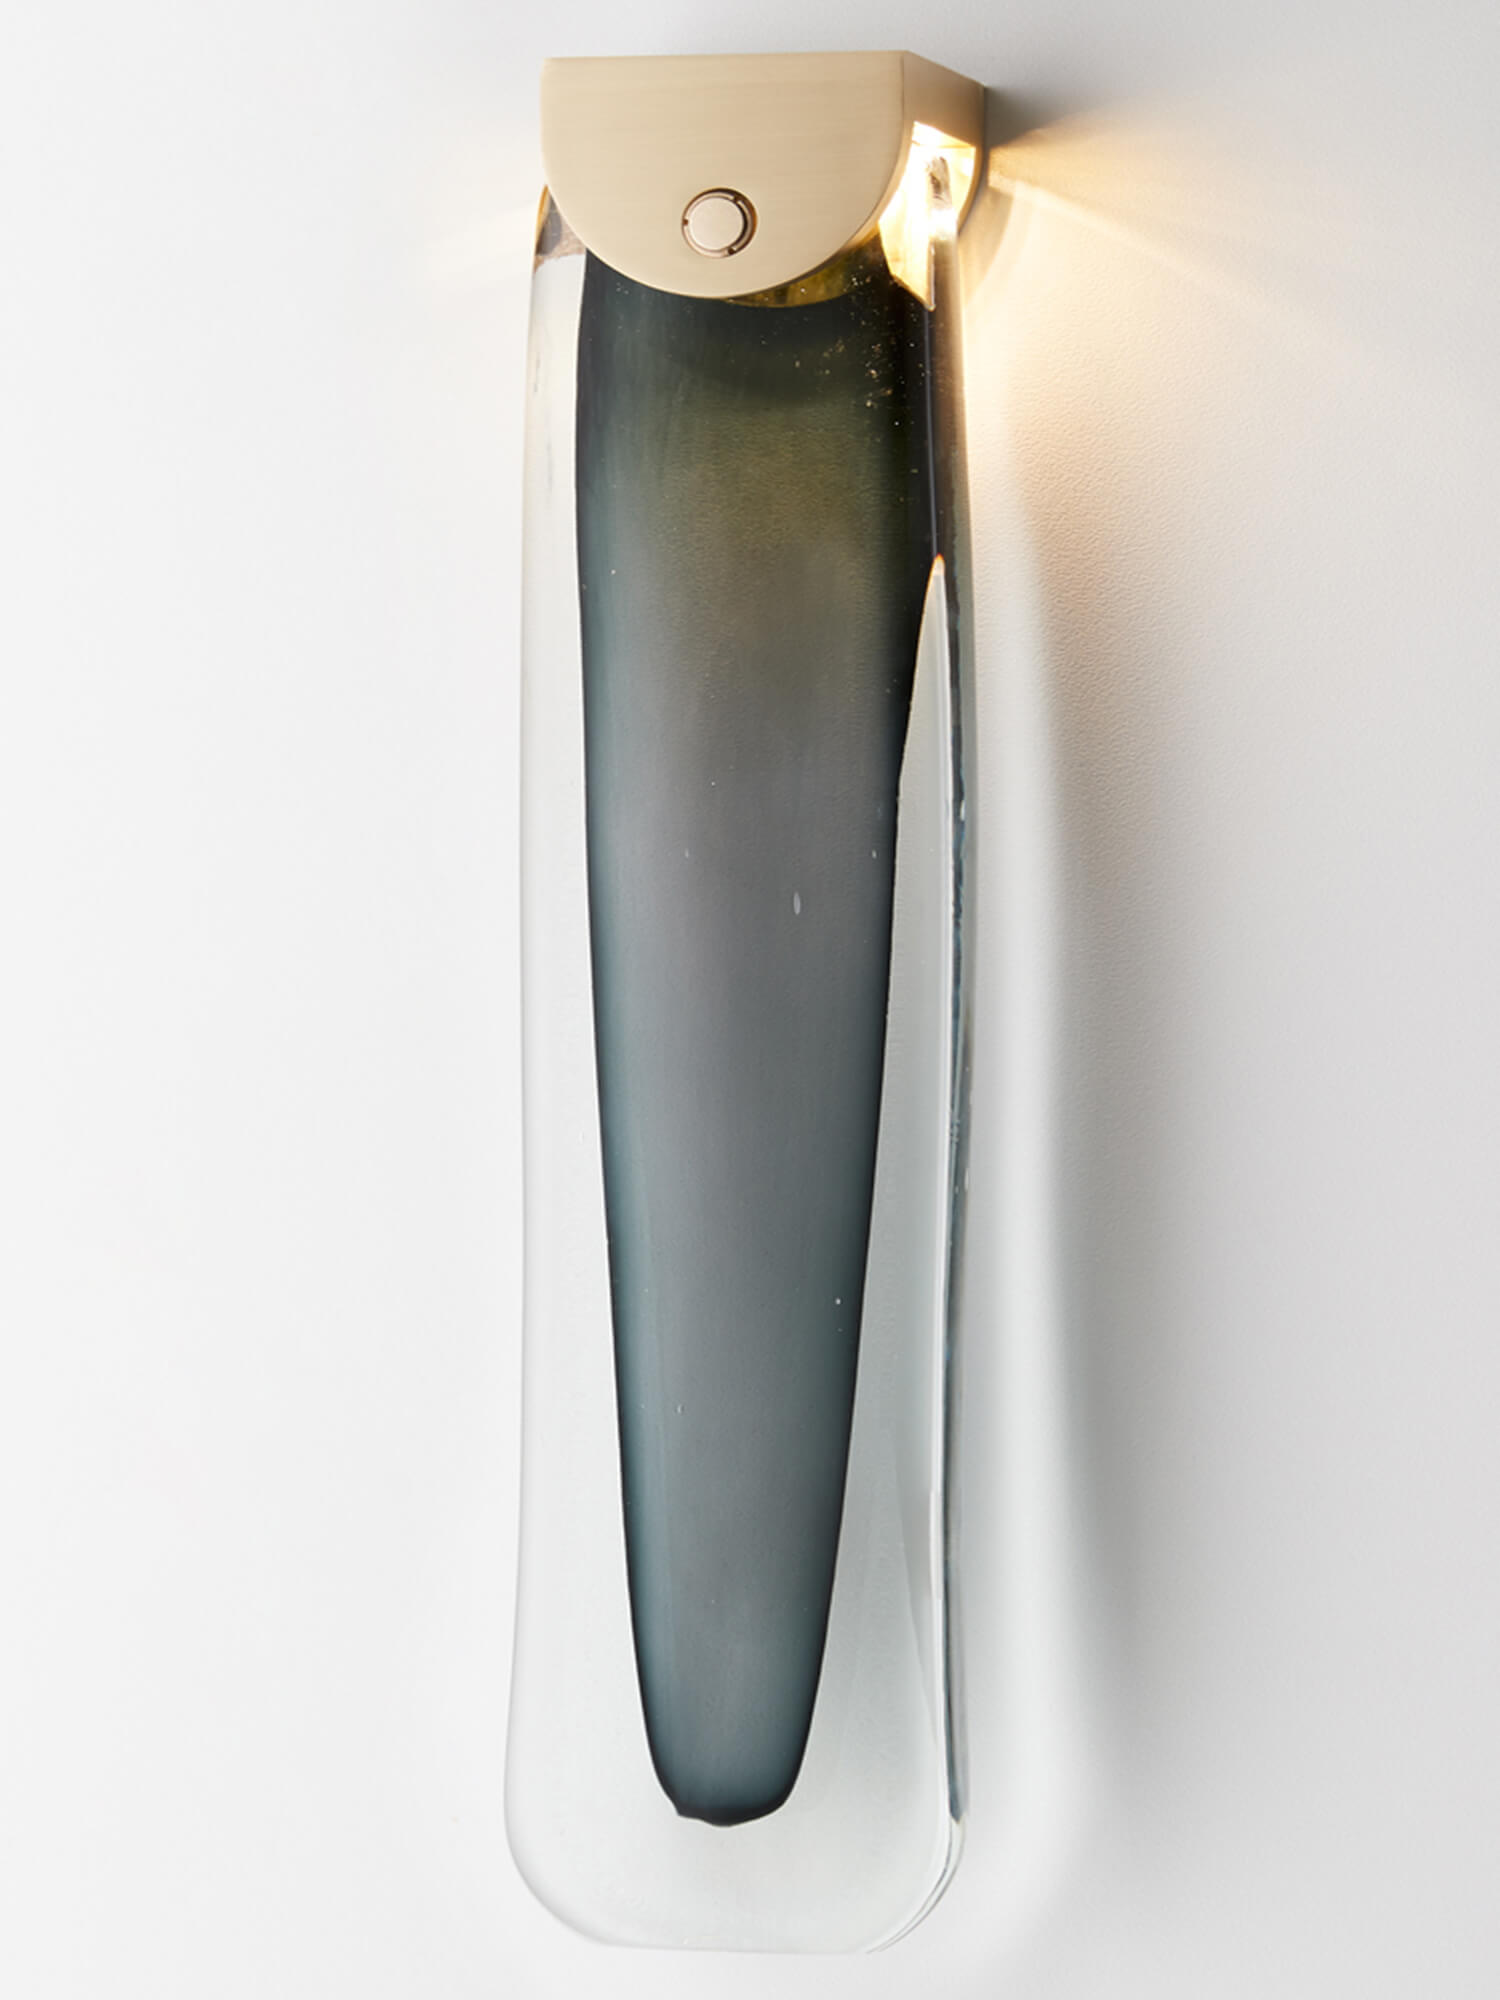 Articolo Lighting Slab Wall Sconce Brass Grey 01